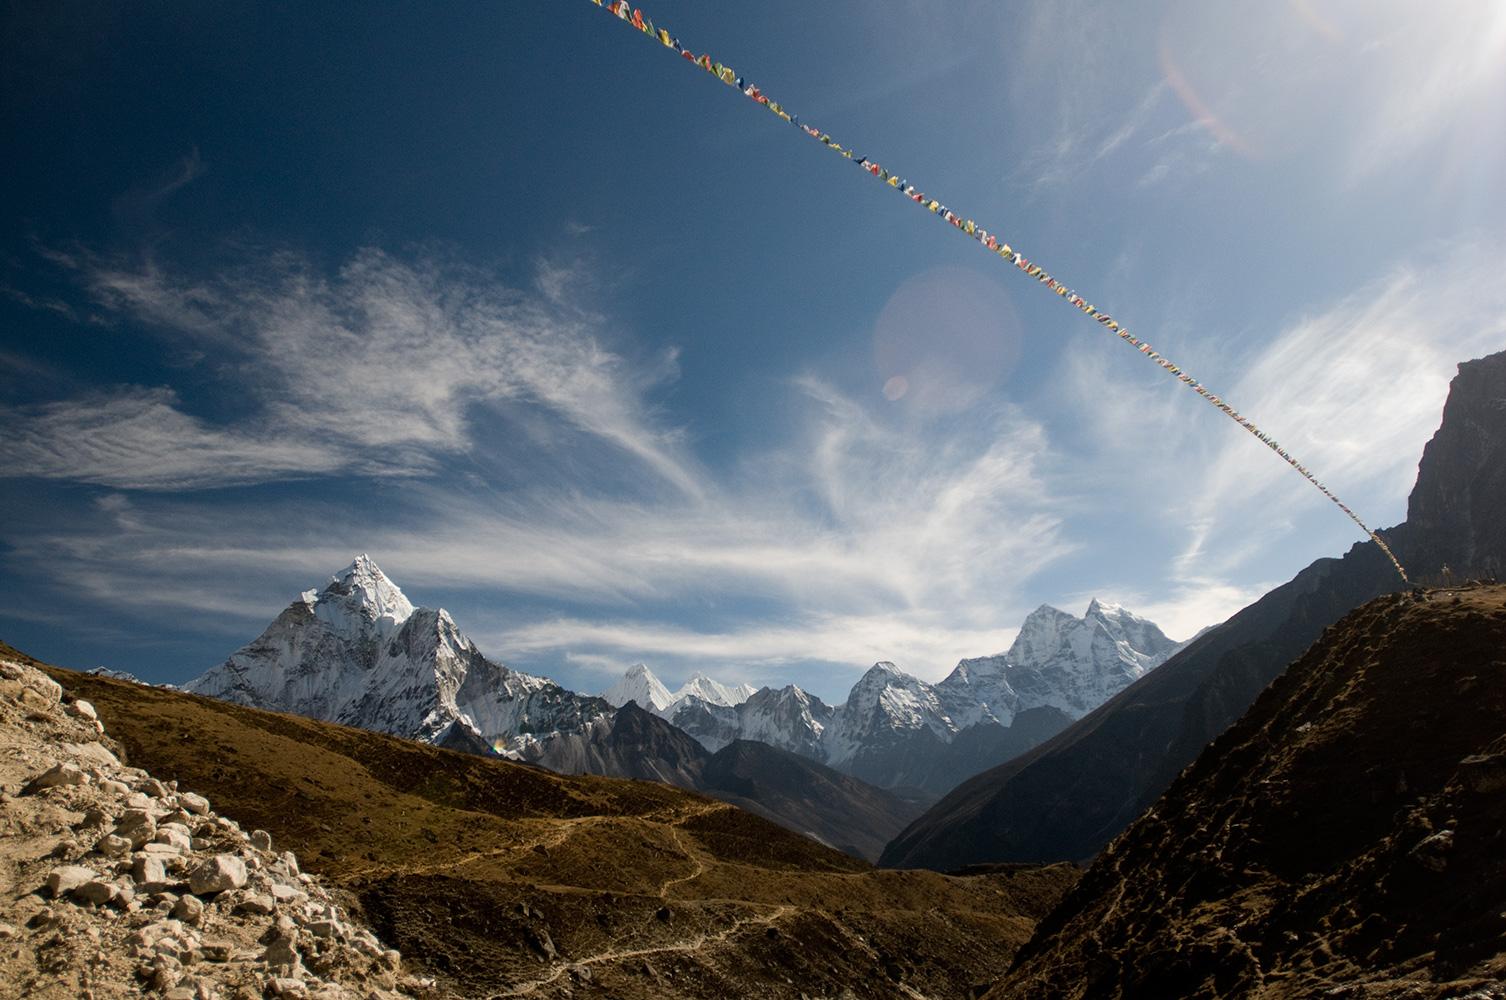 Ama Dablam, Melanphulan & Thamserku under a wintry sky in the Khumbu. December 2008Nikon D300, 17-35mm